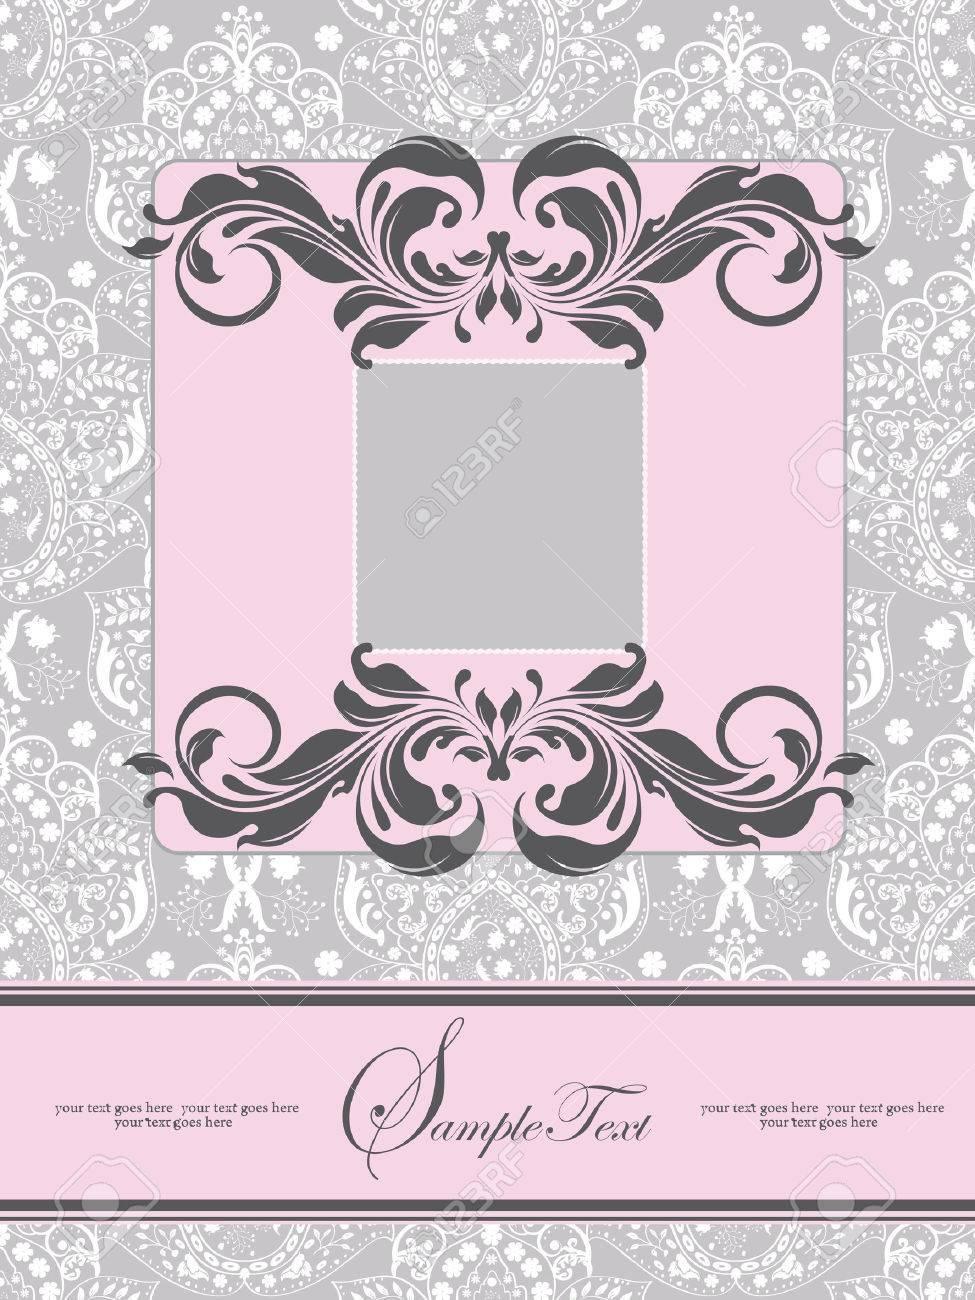 Vintage Wedding Invitation Card With Ornate Elegant Abstract